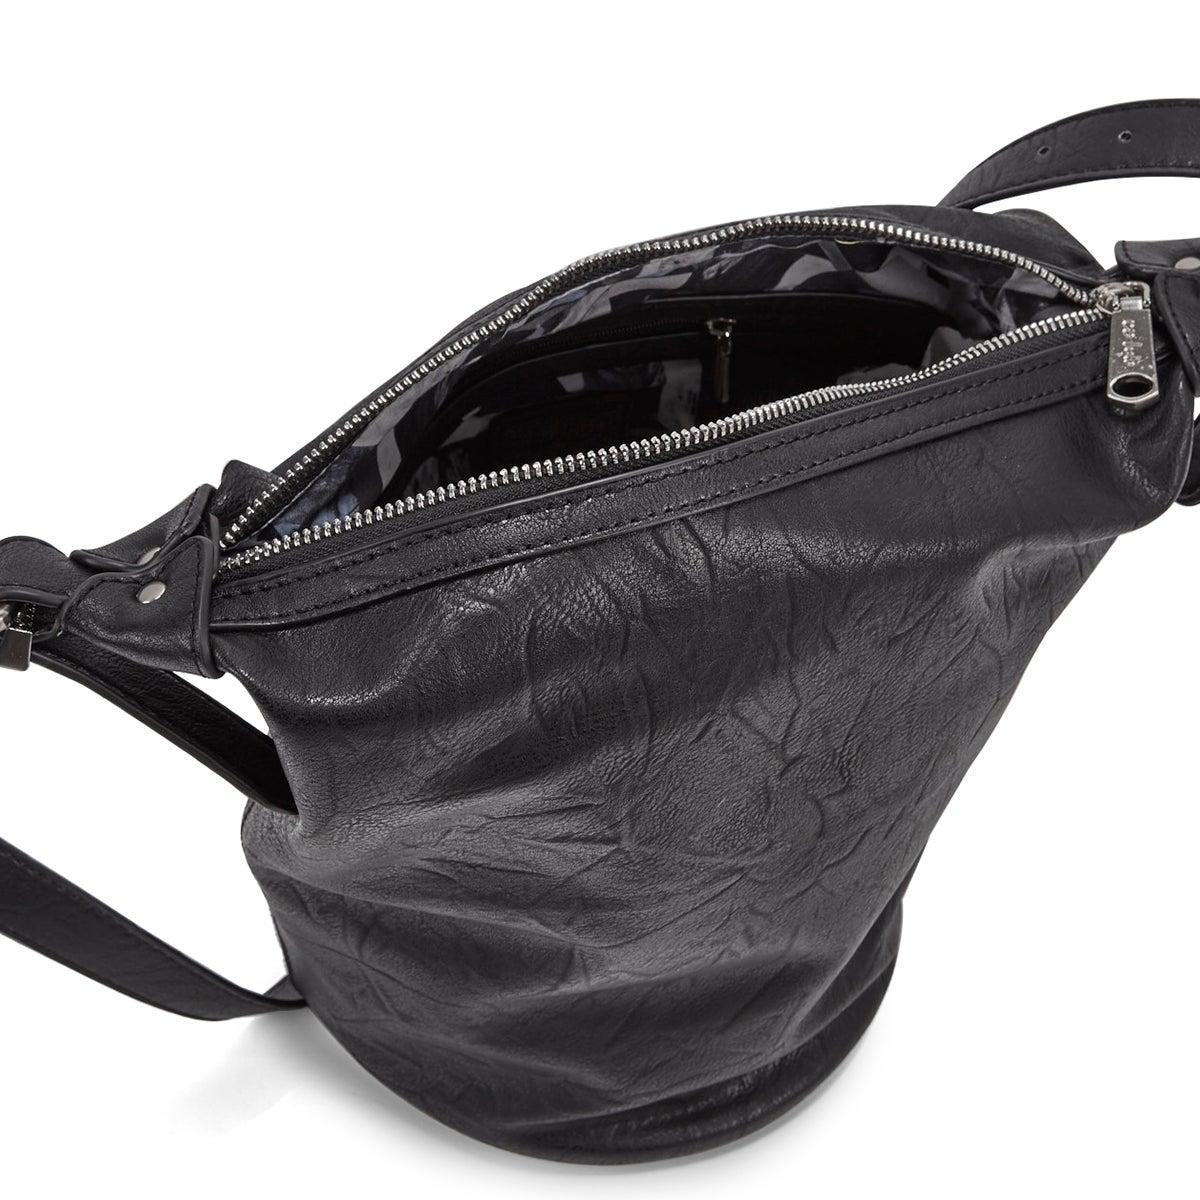 Lds Summer Bucket black hobo bag